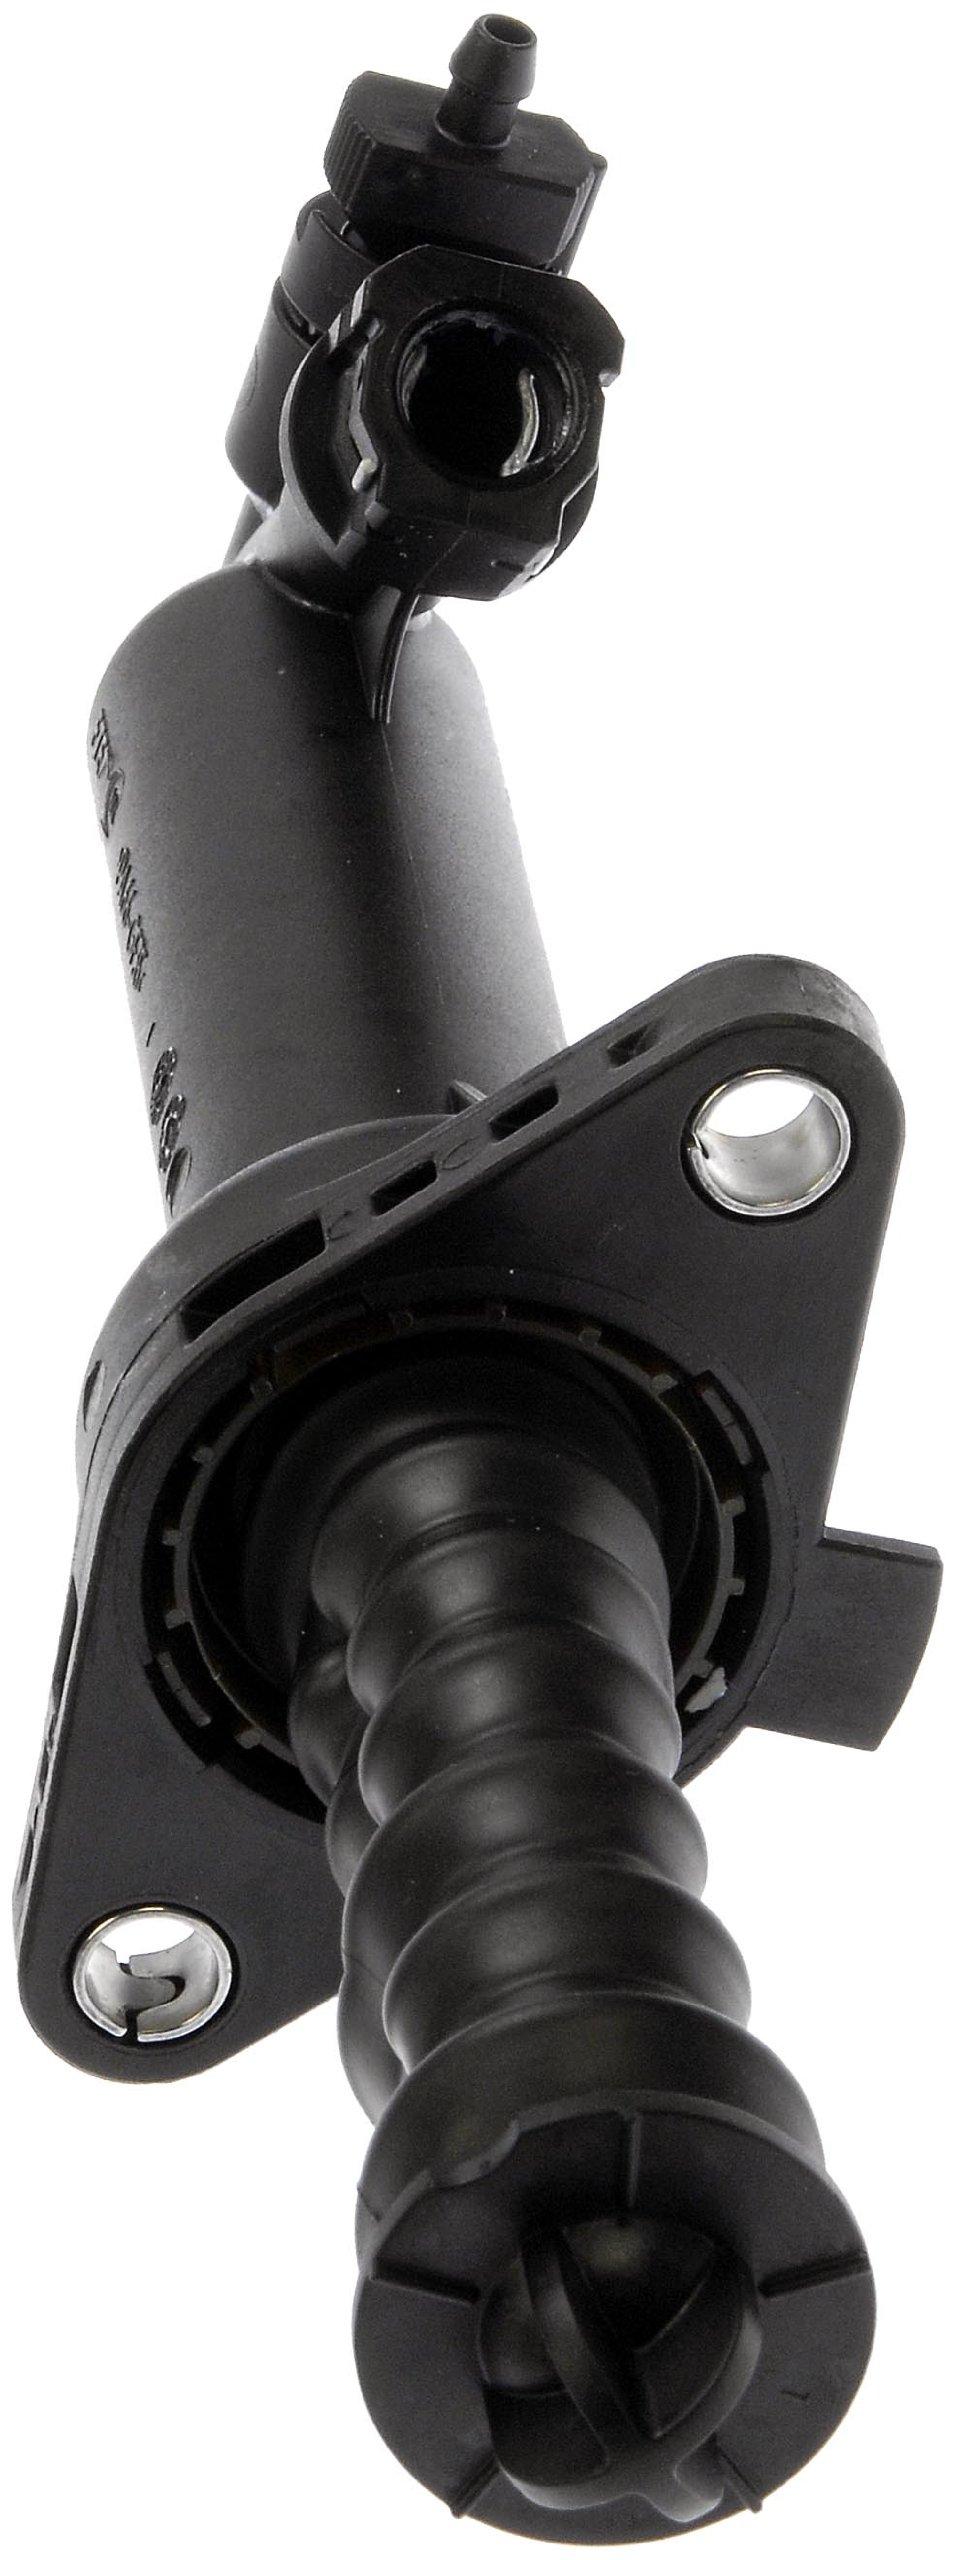 Dorman CS650159 New Clutch Slave Cylinder by Dorman (Image #1)